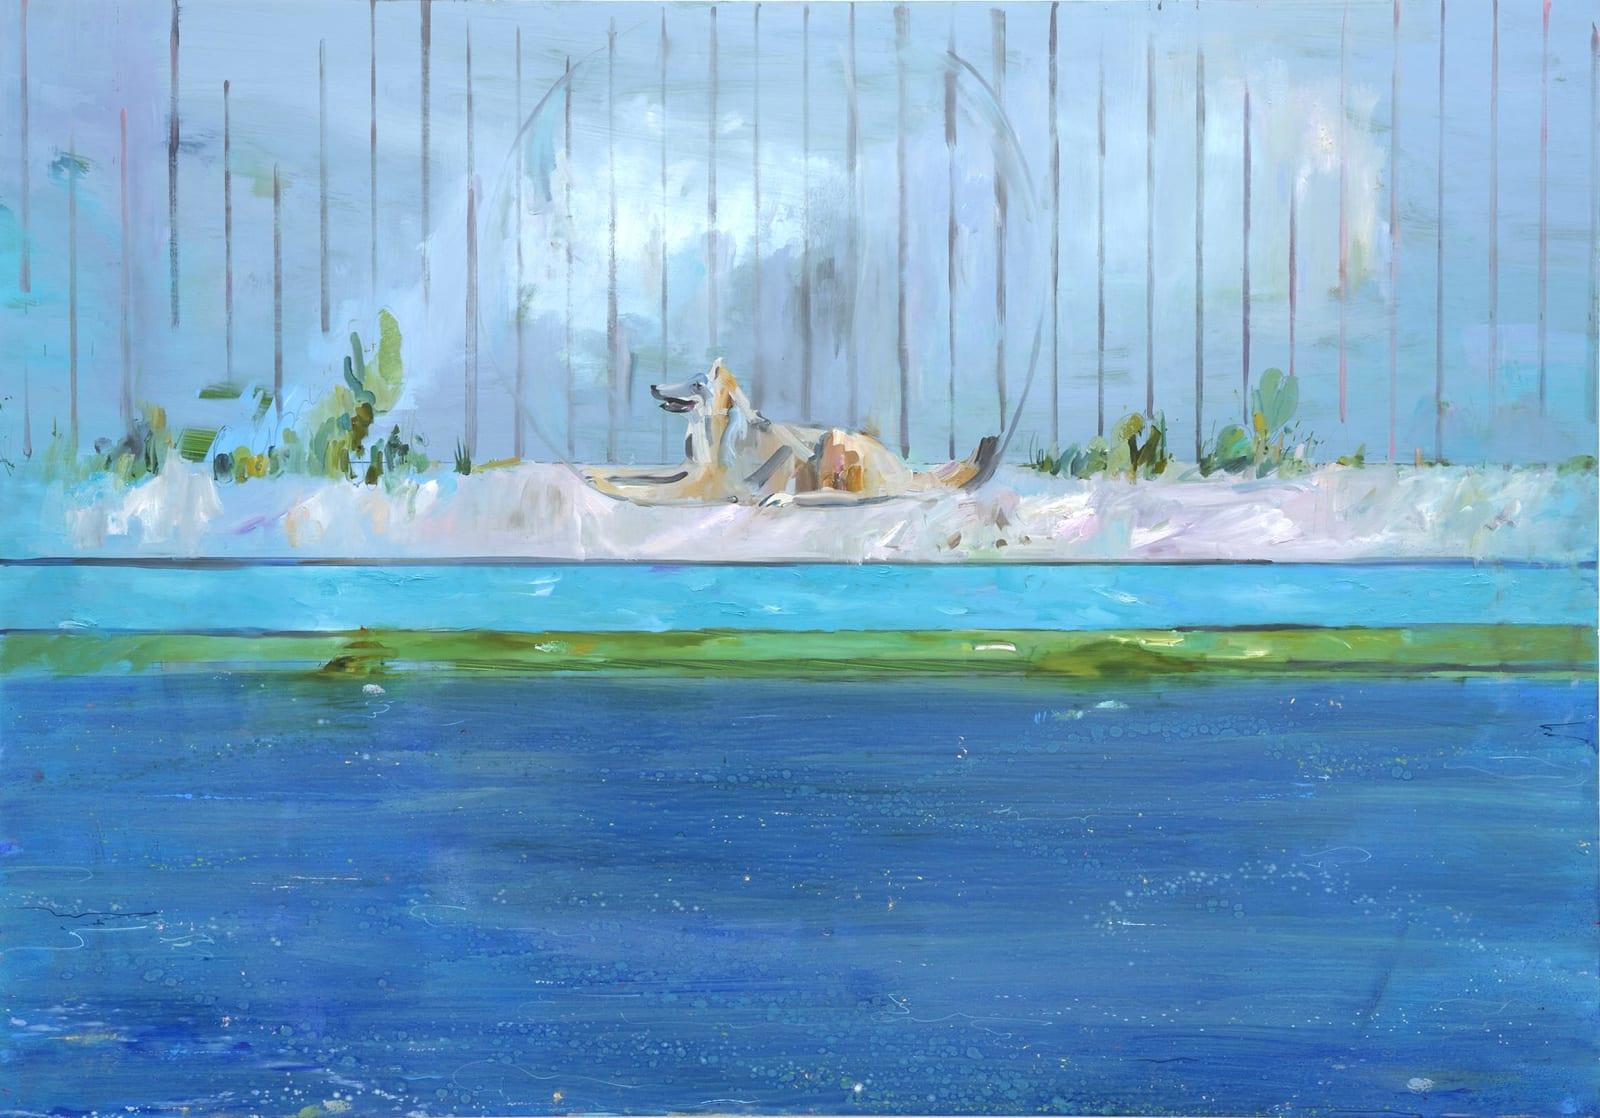 Gabhann Dunne Mosney Oil on gesso panel 70 x 100 cm